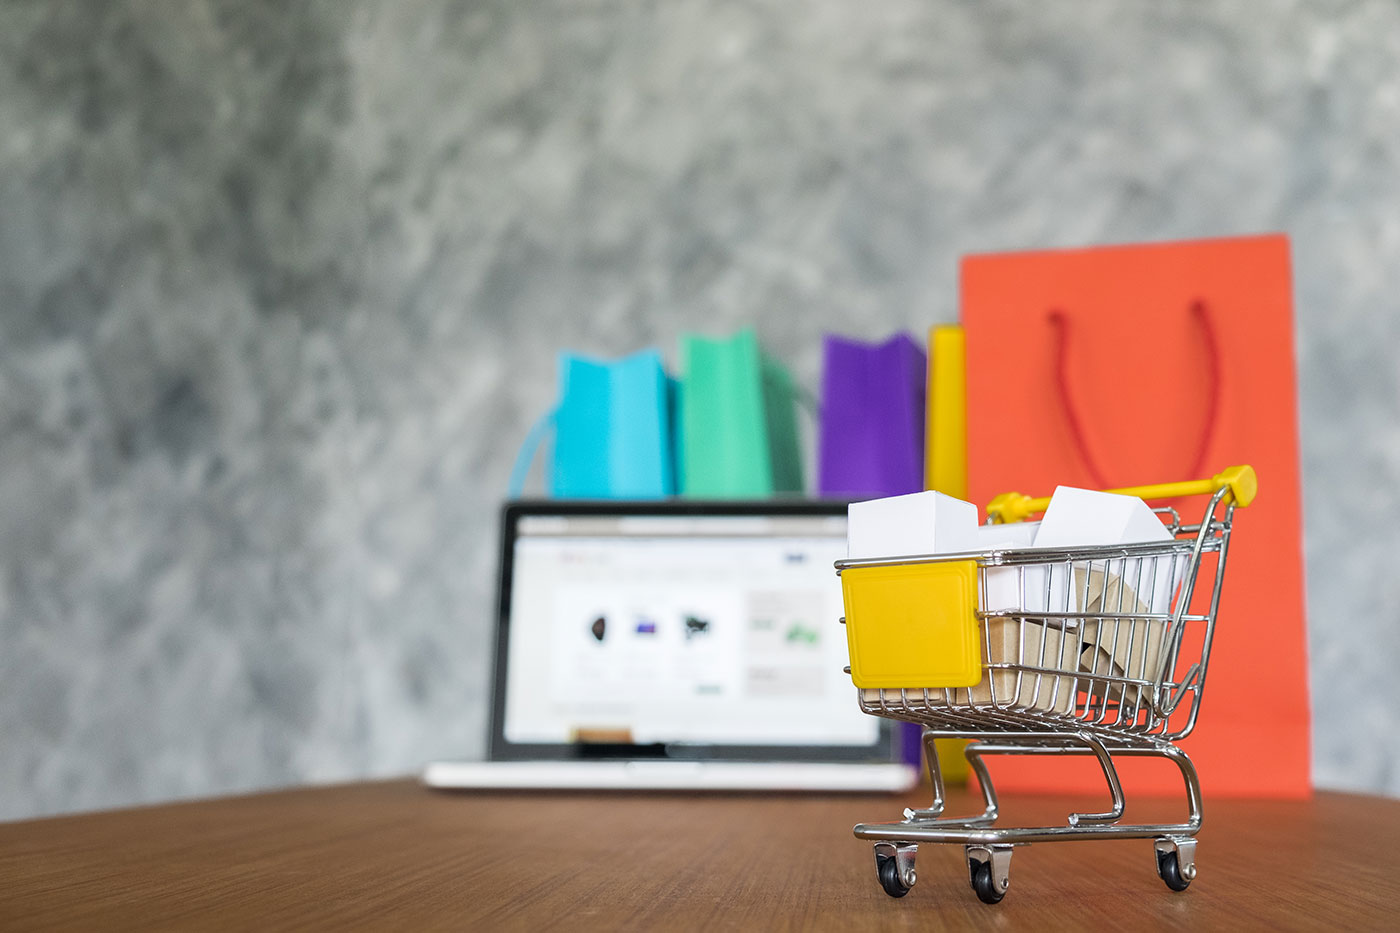 diseño d etiendas en linea en bogota colombia proyectos ecommerce